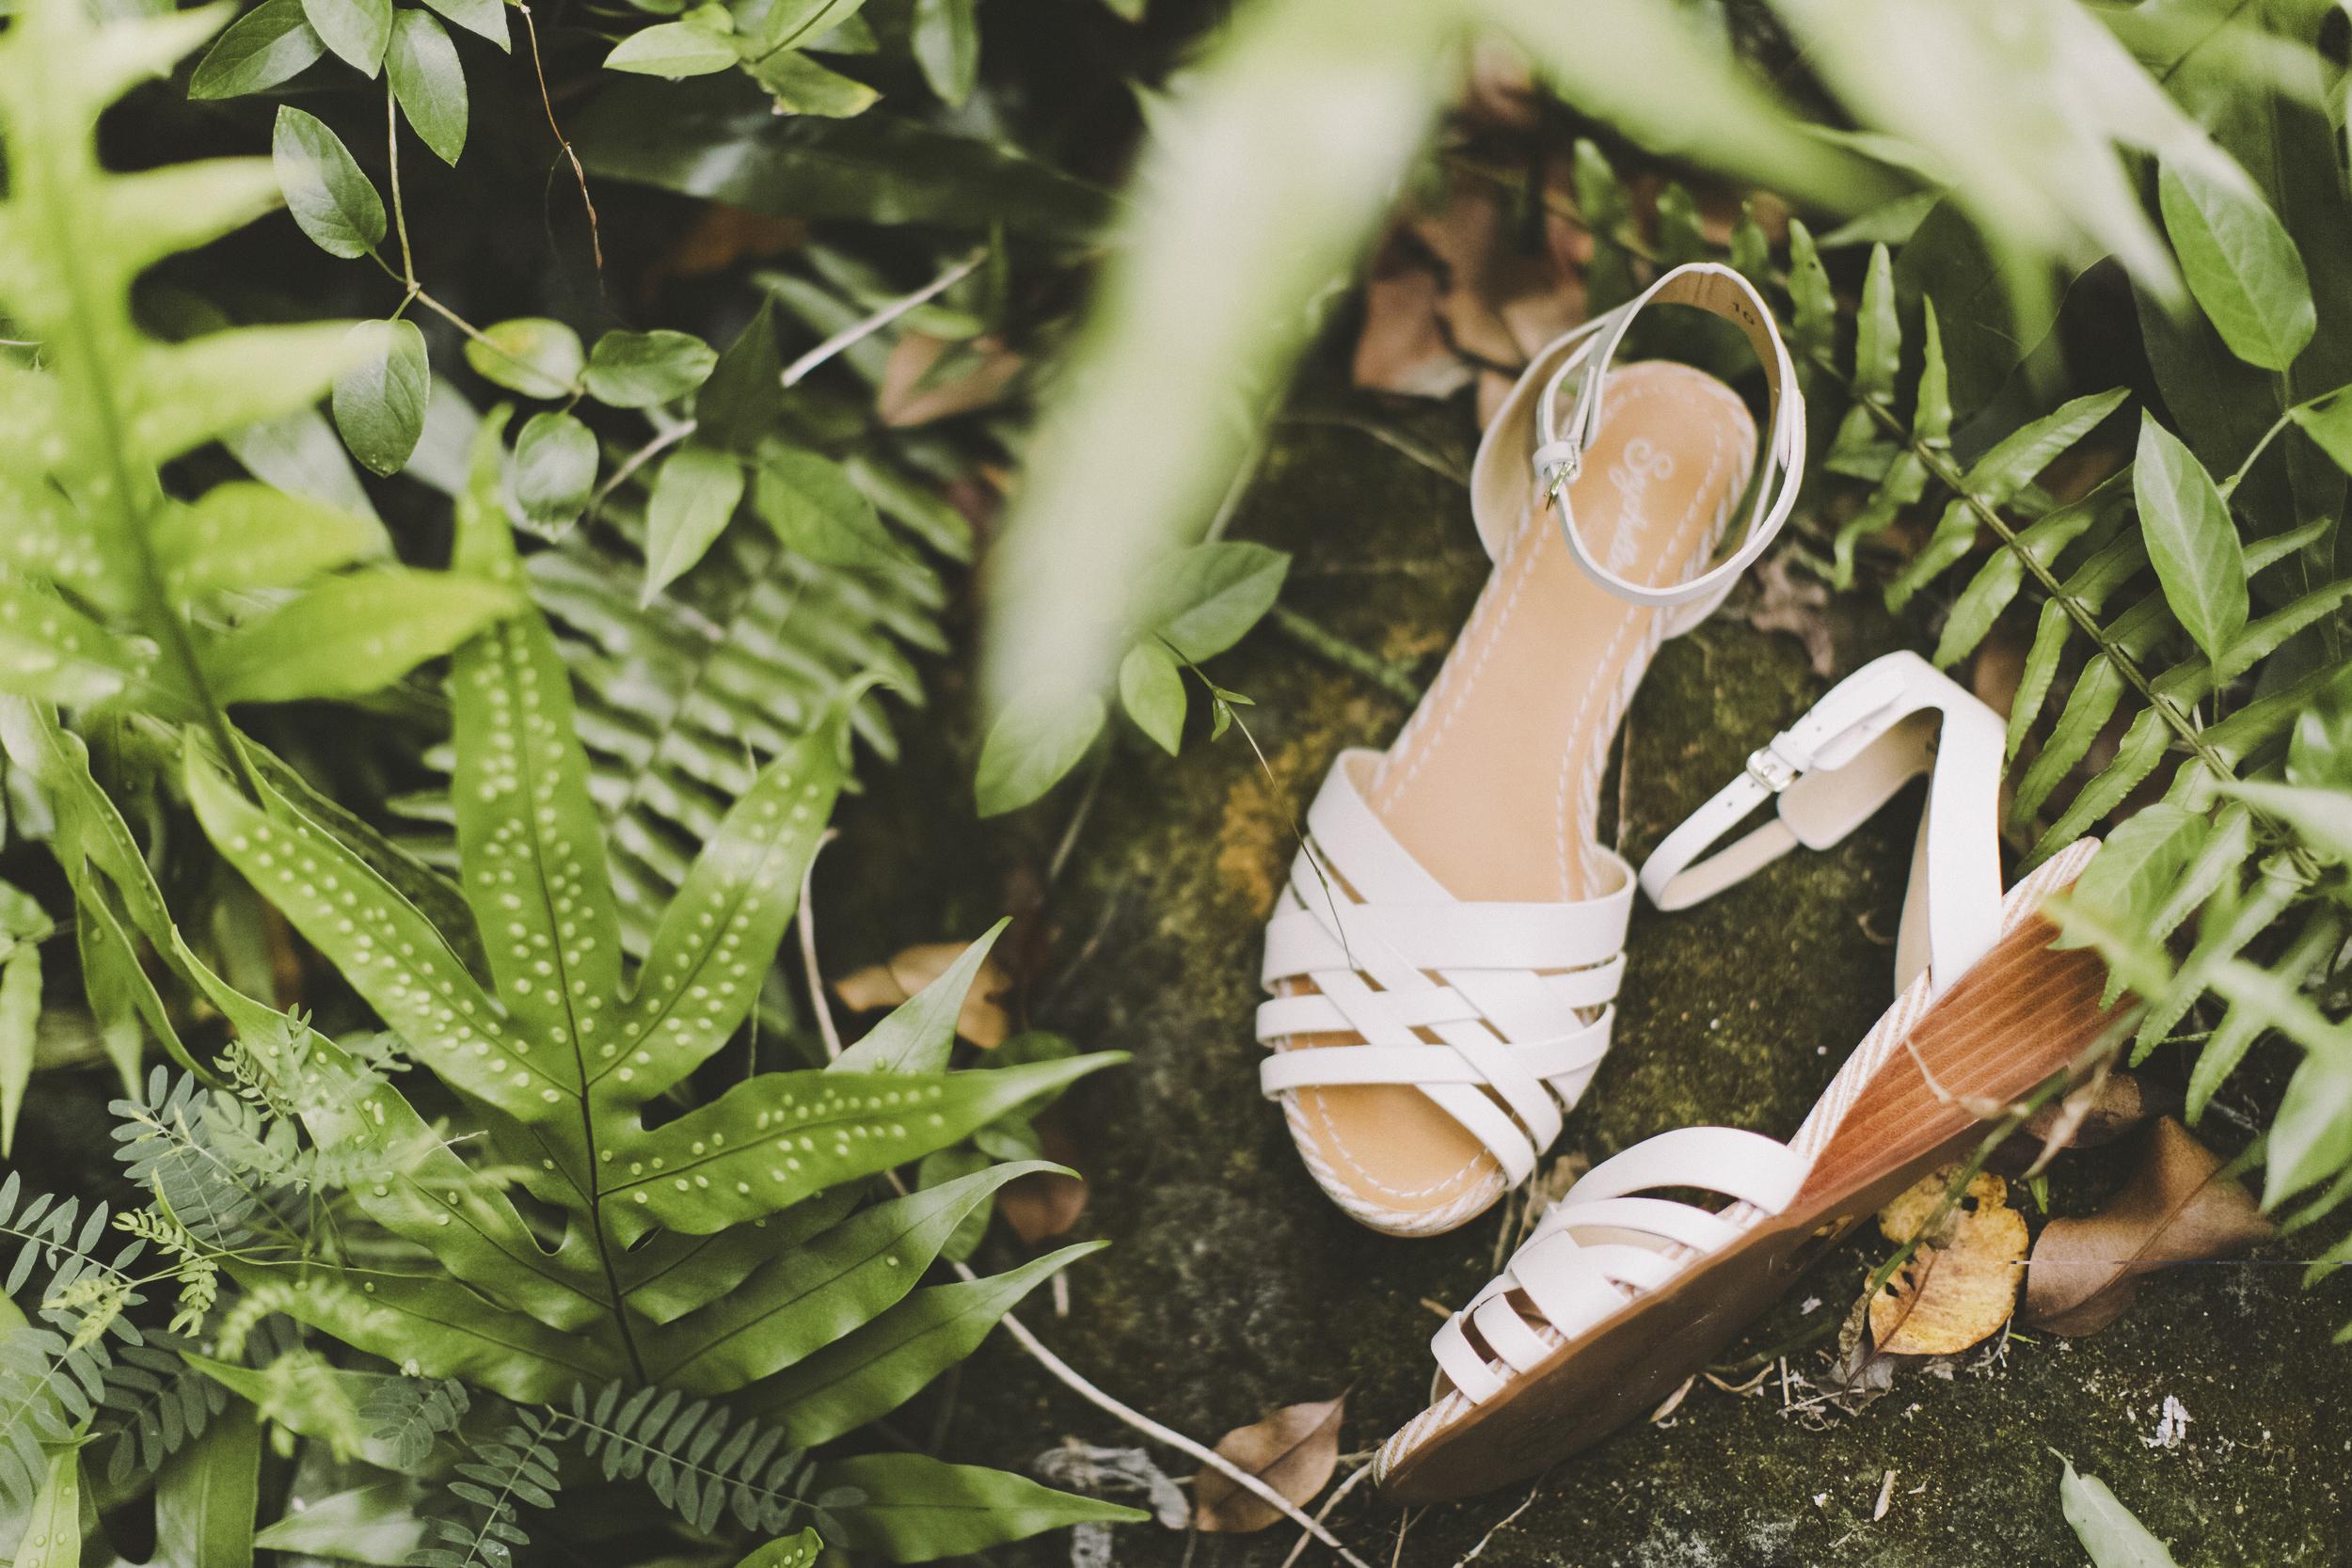 angie-diaz-photography-oahu-hawaii-wedding-tradewinds-ranch-04.jpg